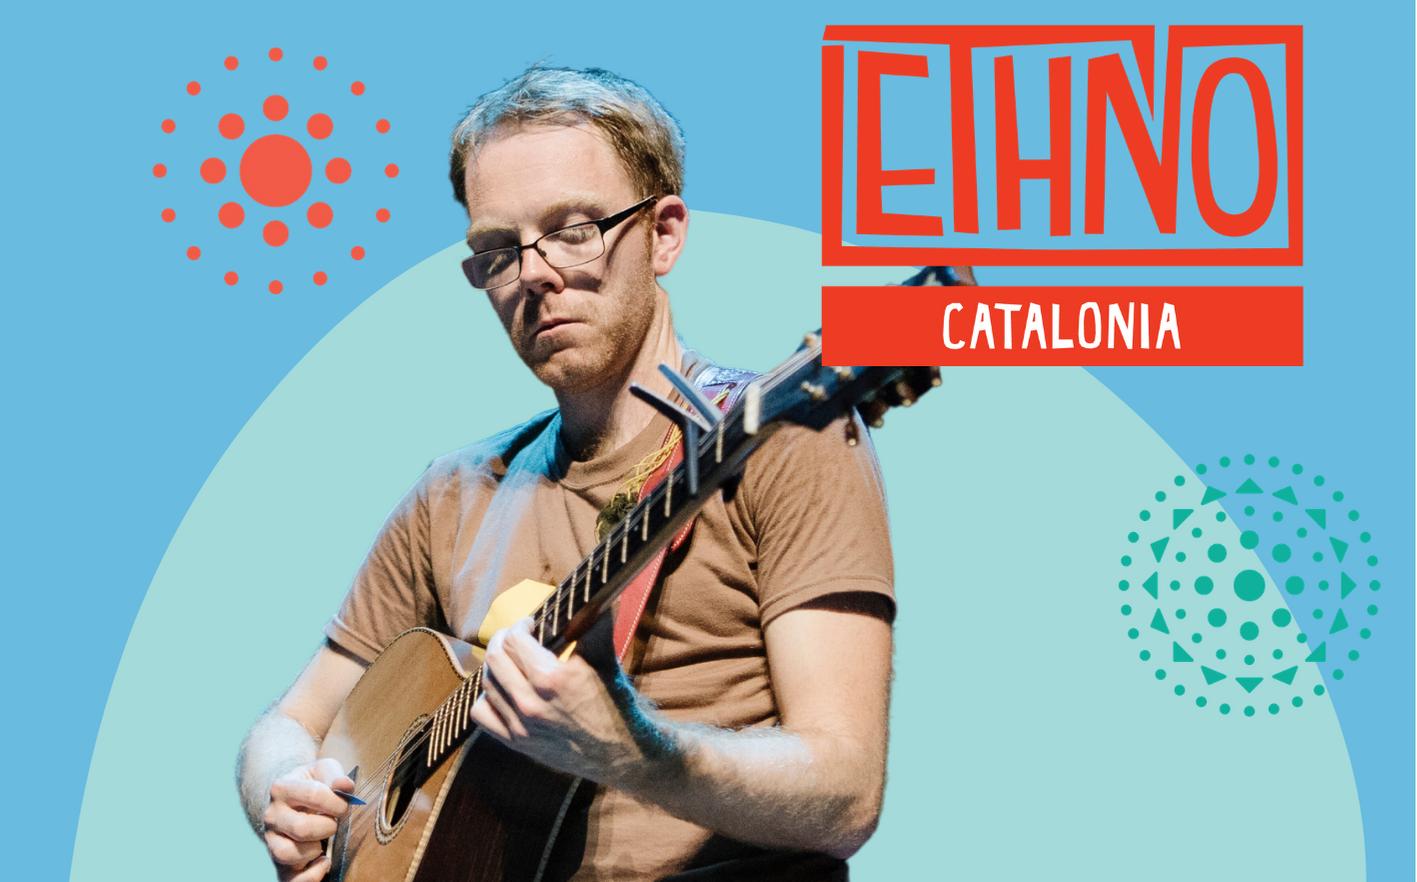 Ethno Catalonia